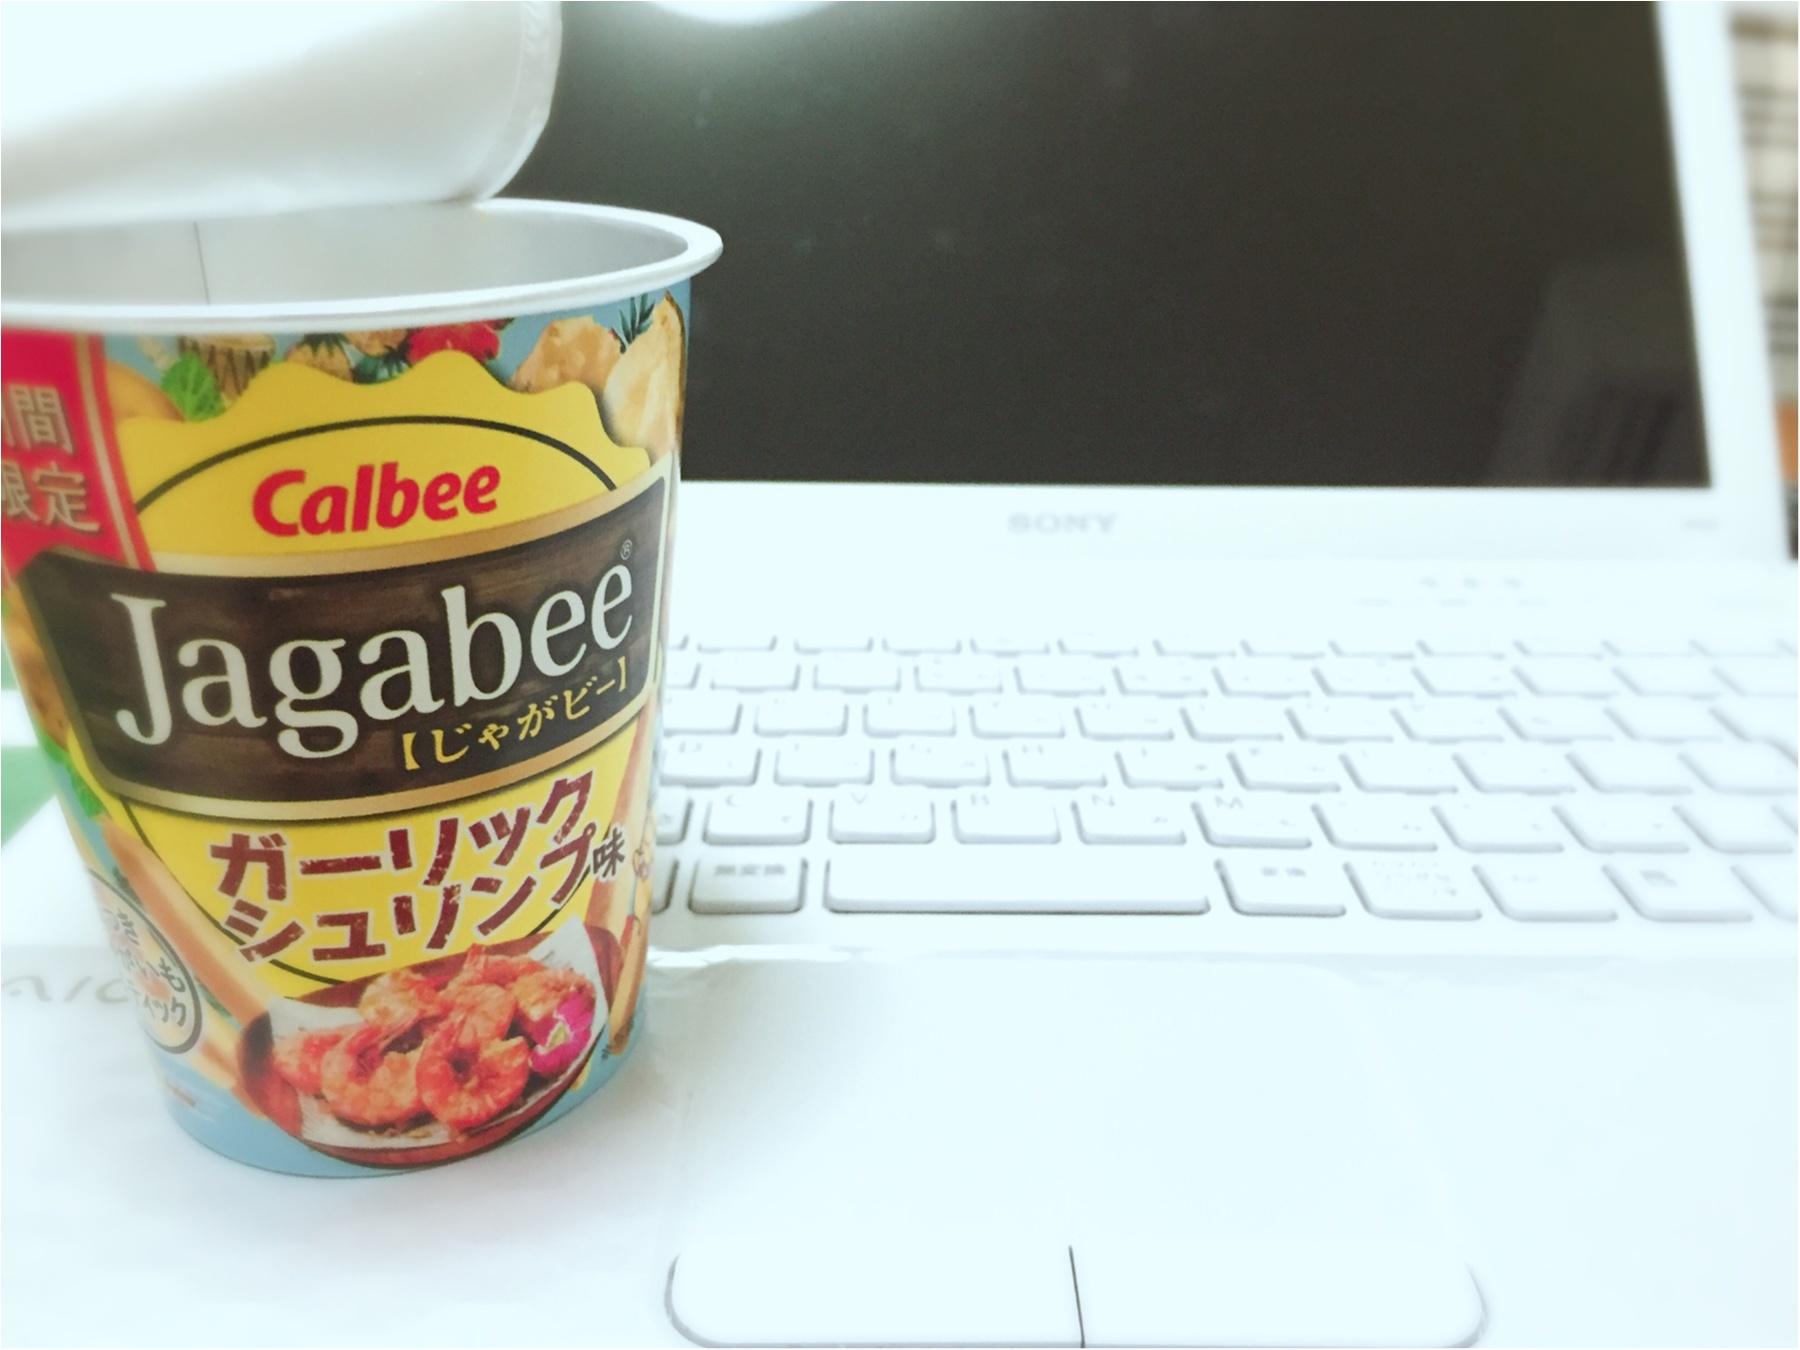 …ஐ 【期間限定Jagabee】ガーリックシュリンプ味がハマる♡ ஐ¨_2